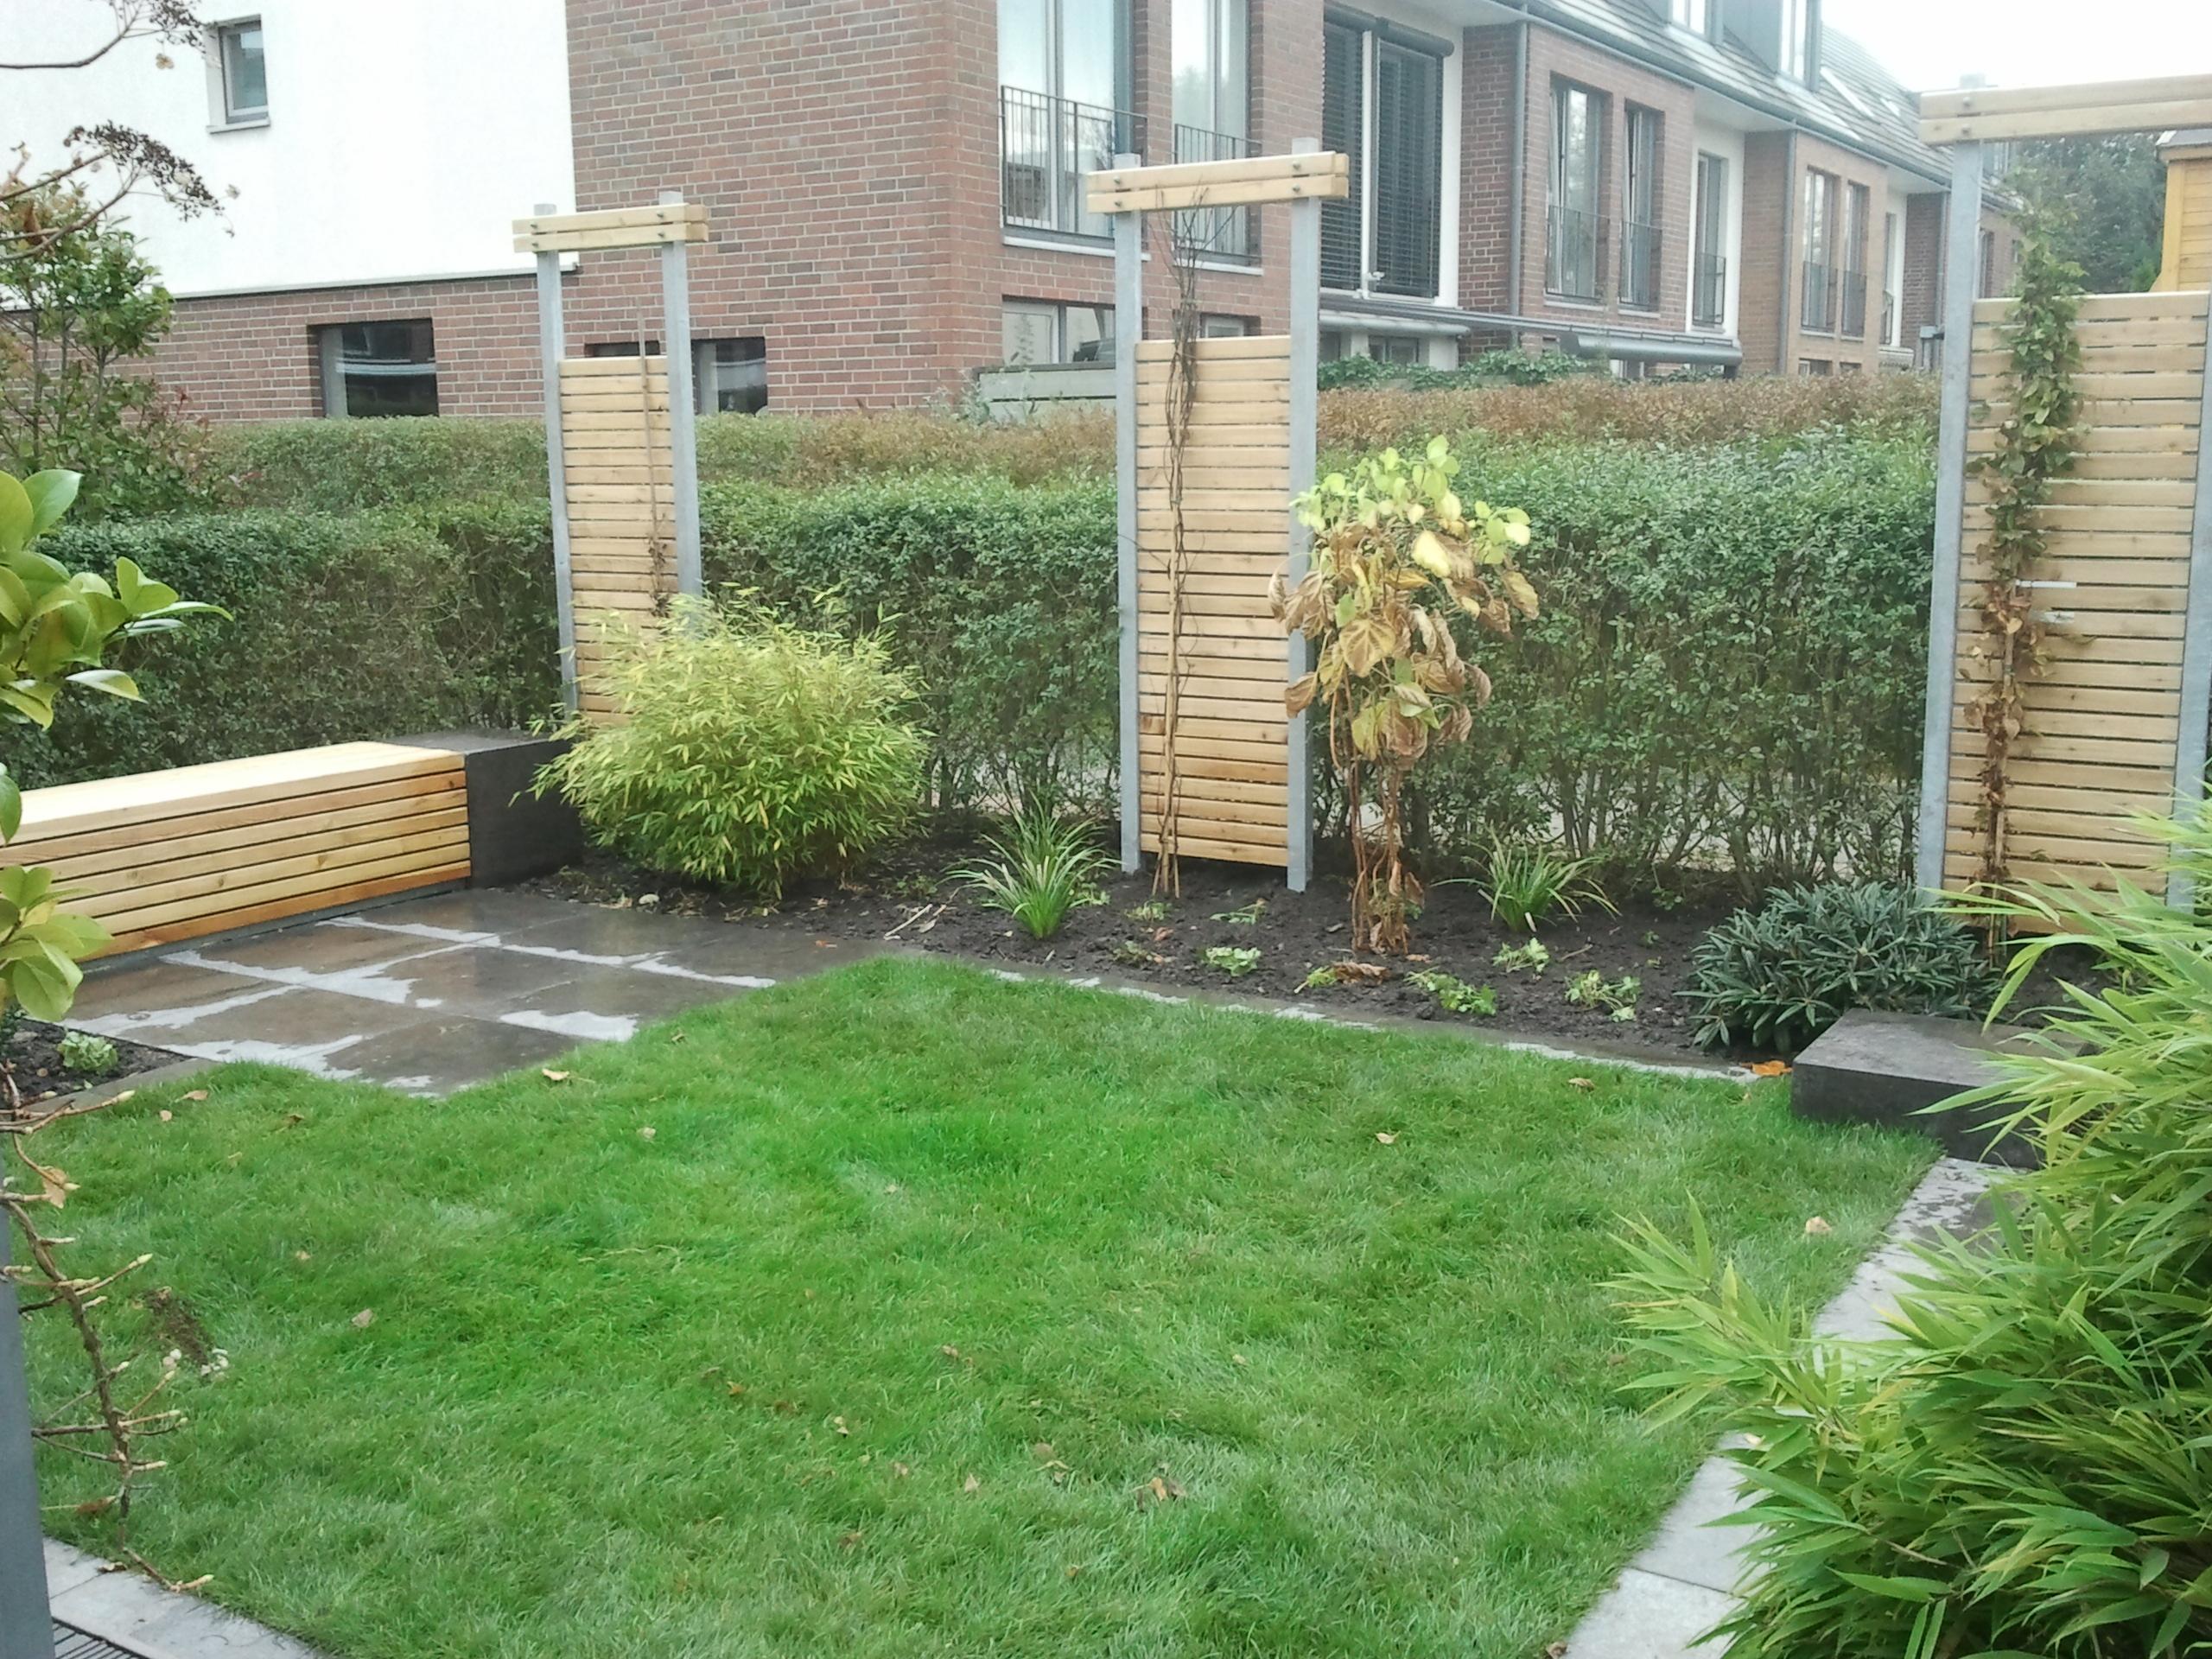 Reihenhausgarten Sichtschutz reihenhausgarten sichtschutz irene alberts